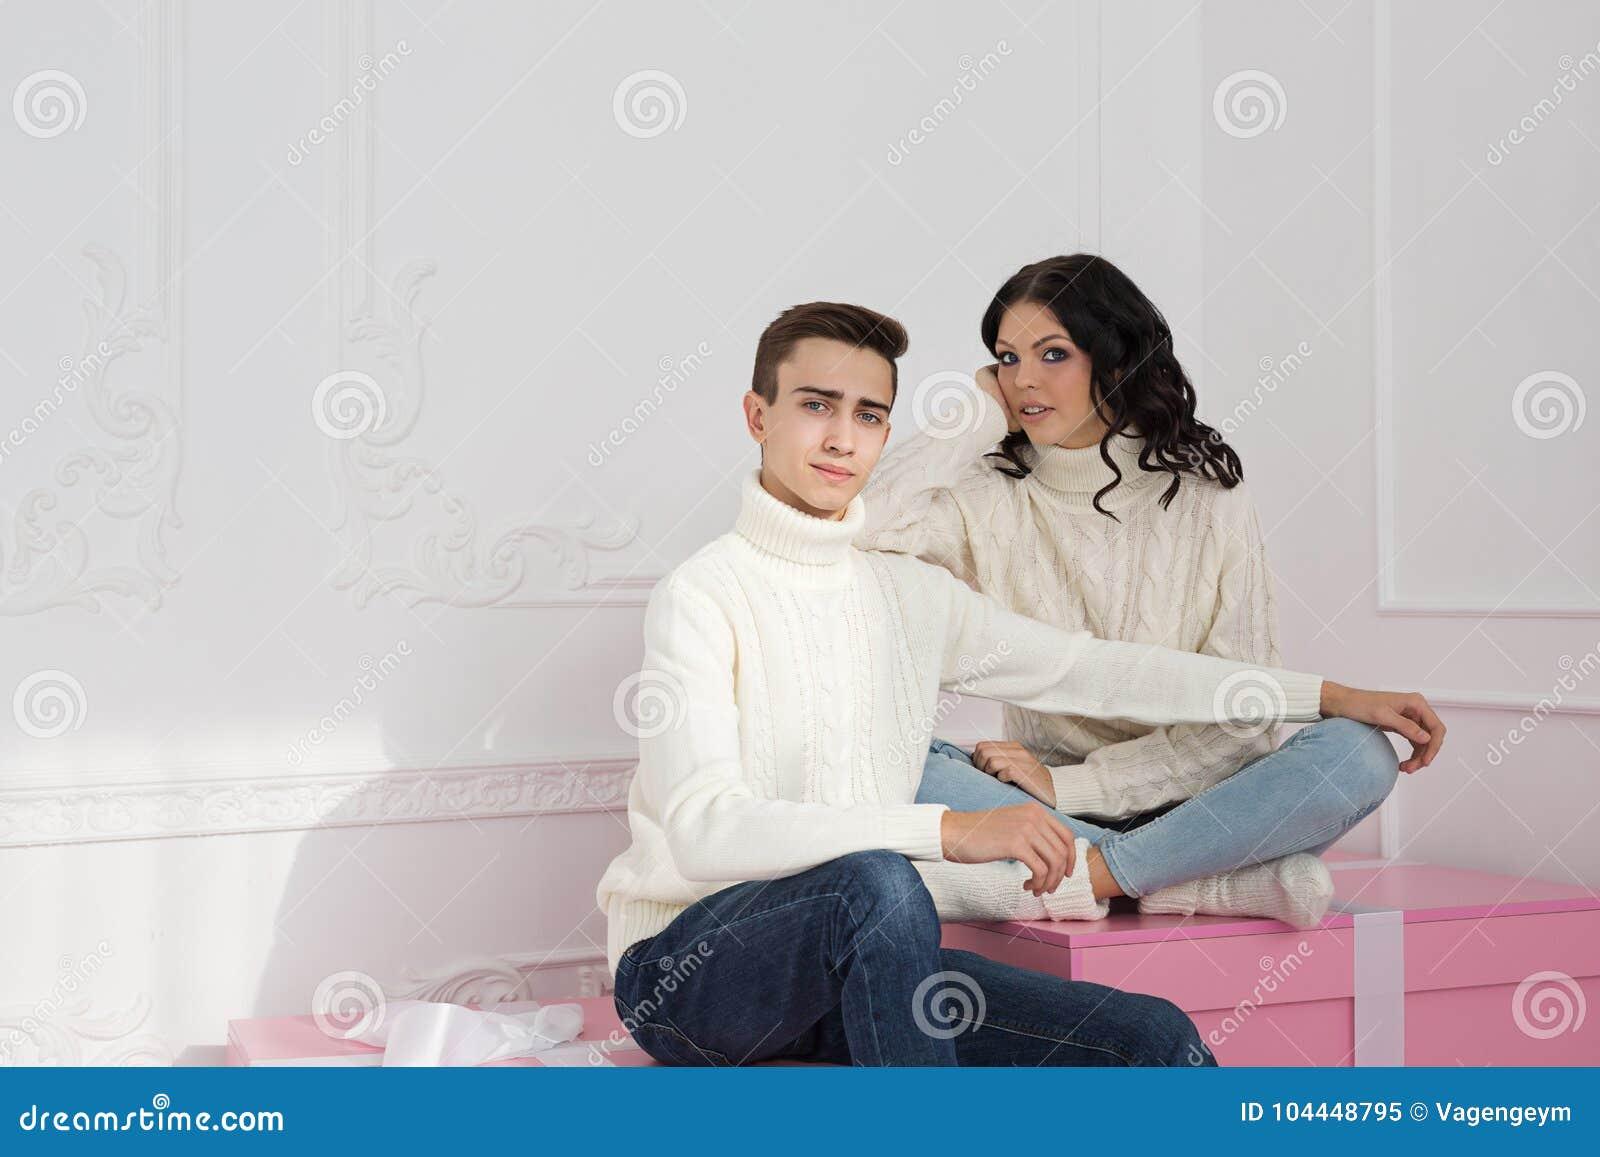 very pity me, richtig flirten chatten you inquisitive mind confirm